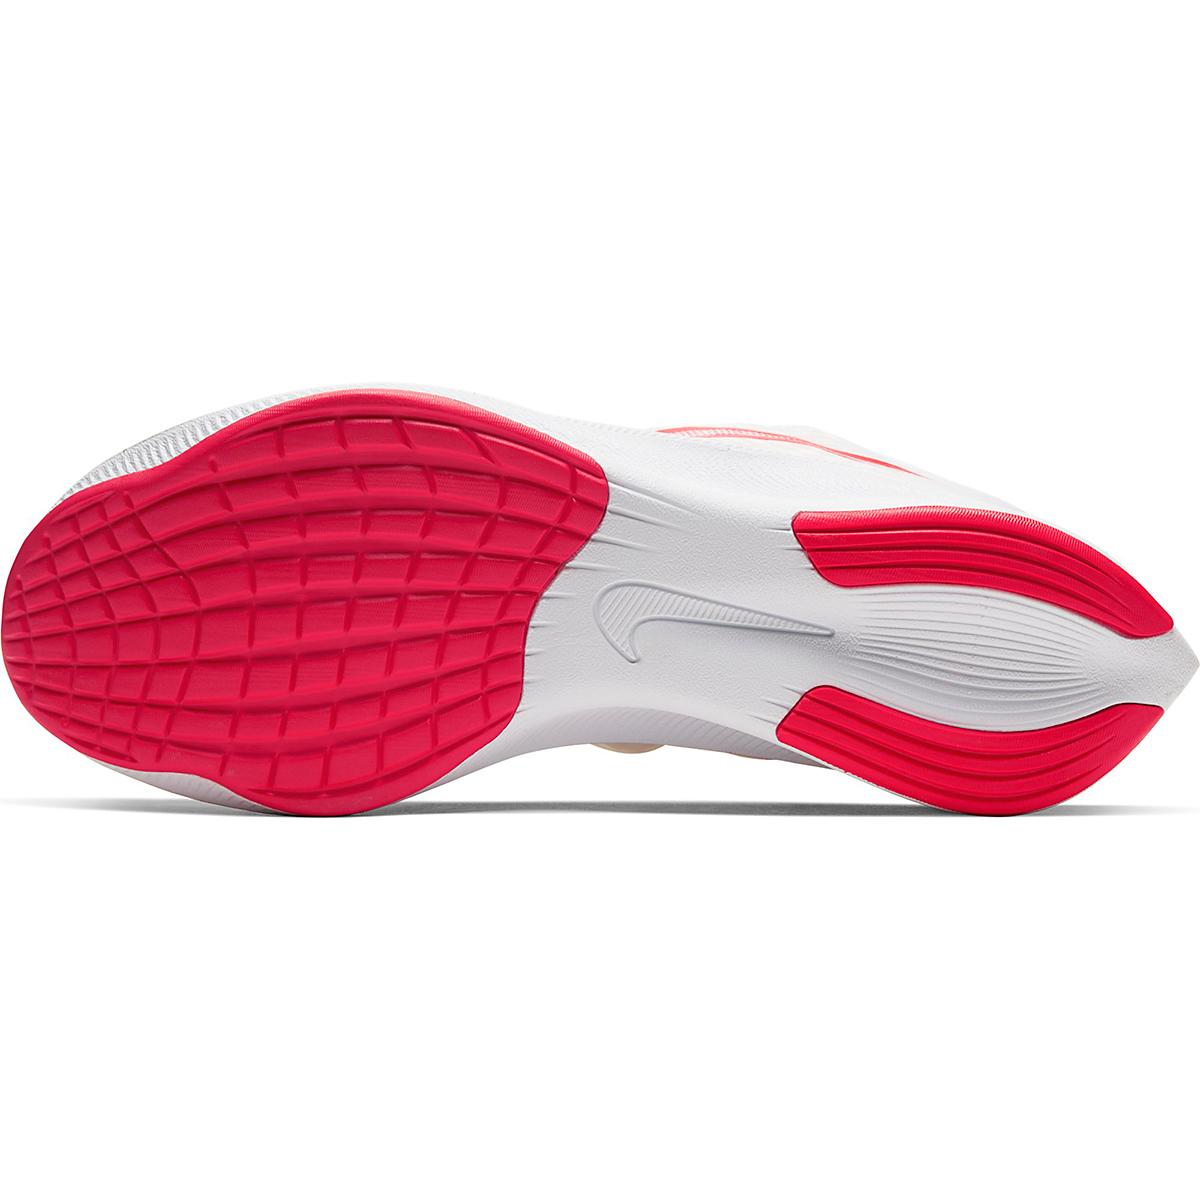 Men's Nike Zoom Fly 3 Running Shoe - Color: White/Laser Crimson - Size: 6 - Width: Regular, White/Laser Crimson, large, image 3